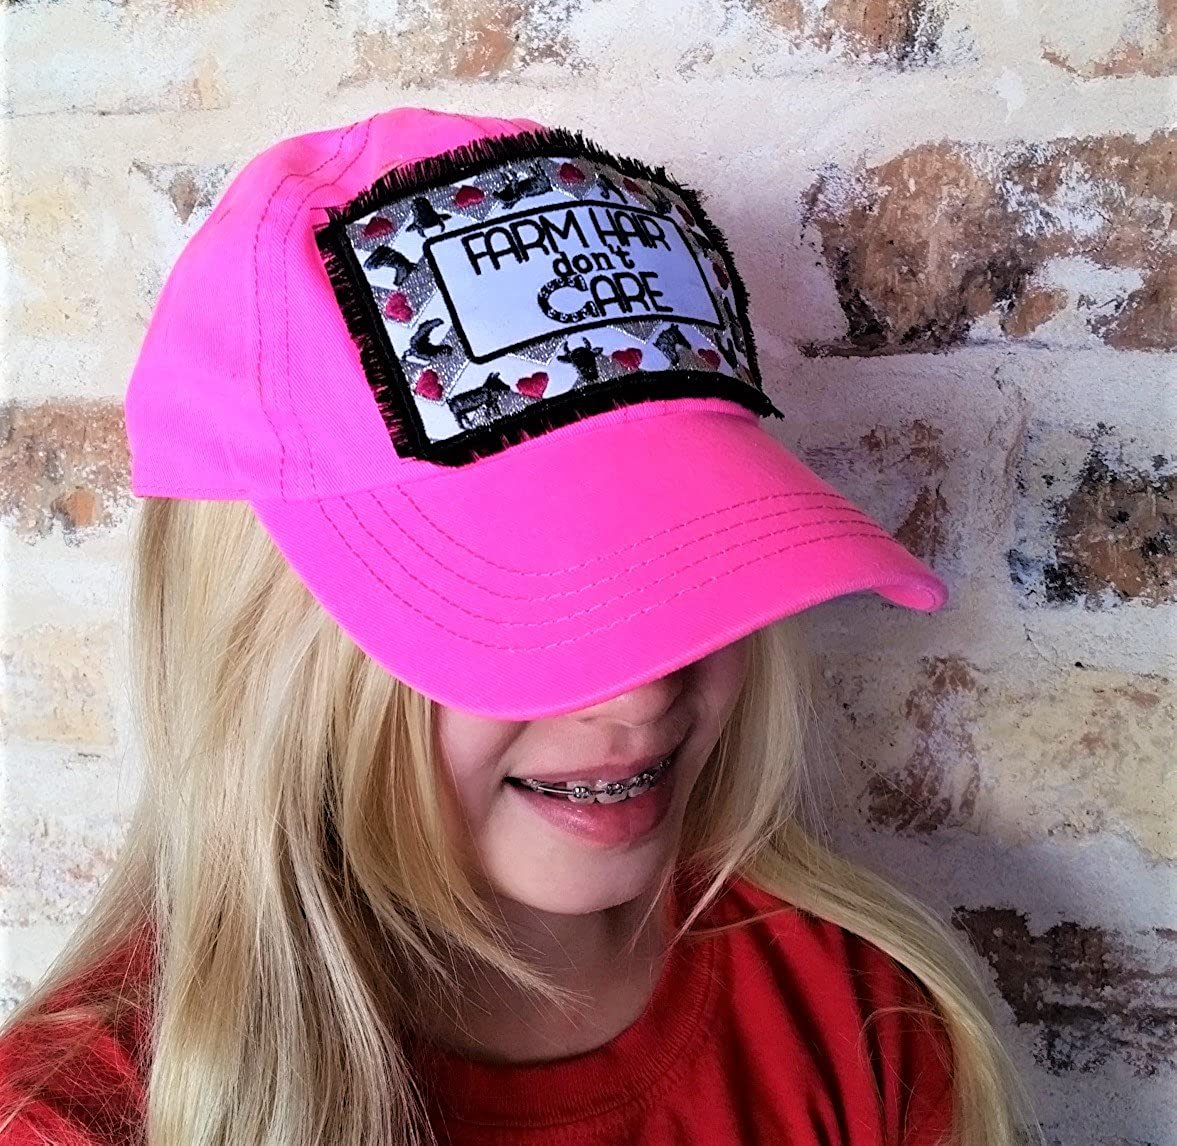 Loaded Lids Girls Farming Farm Hair Dont Care Bling Patch Baseball Cap Hot Pink